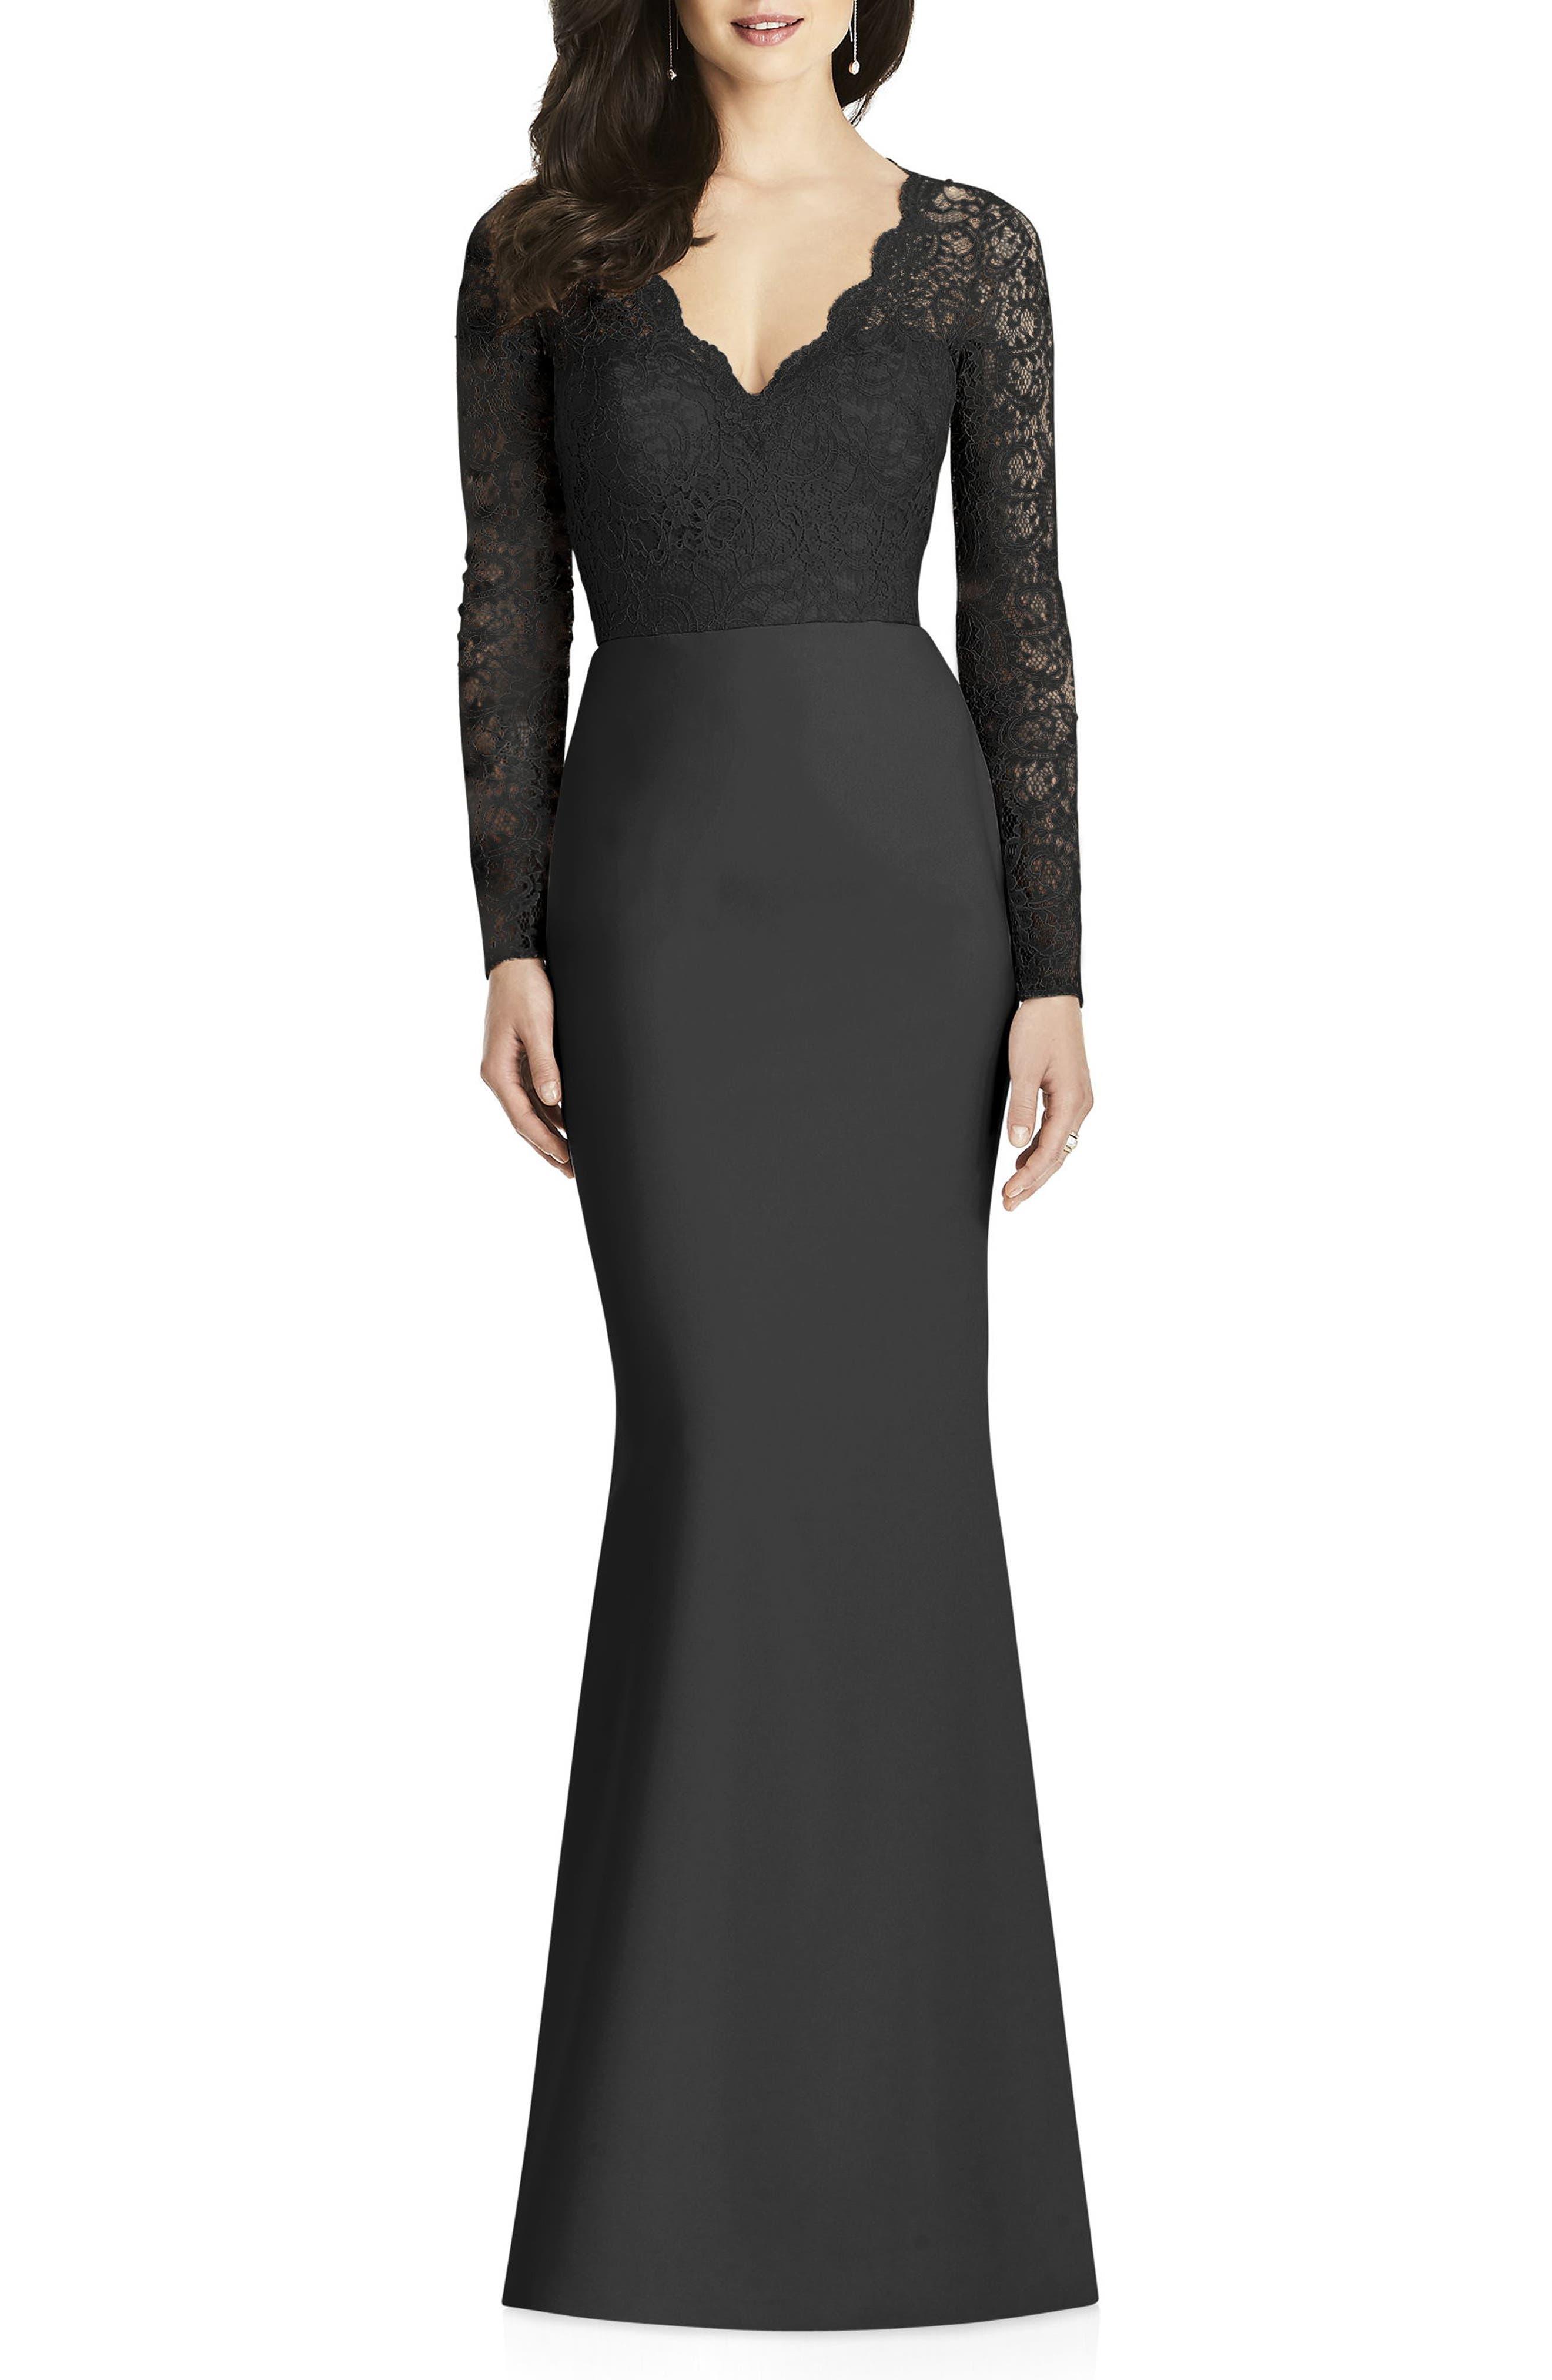 DESSY COLLECTION, Lace & Crepe Trumpet Gown, Main thumbnail 1, color, BLACK